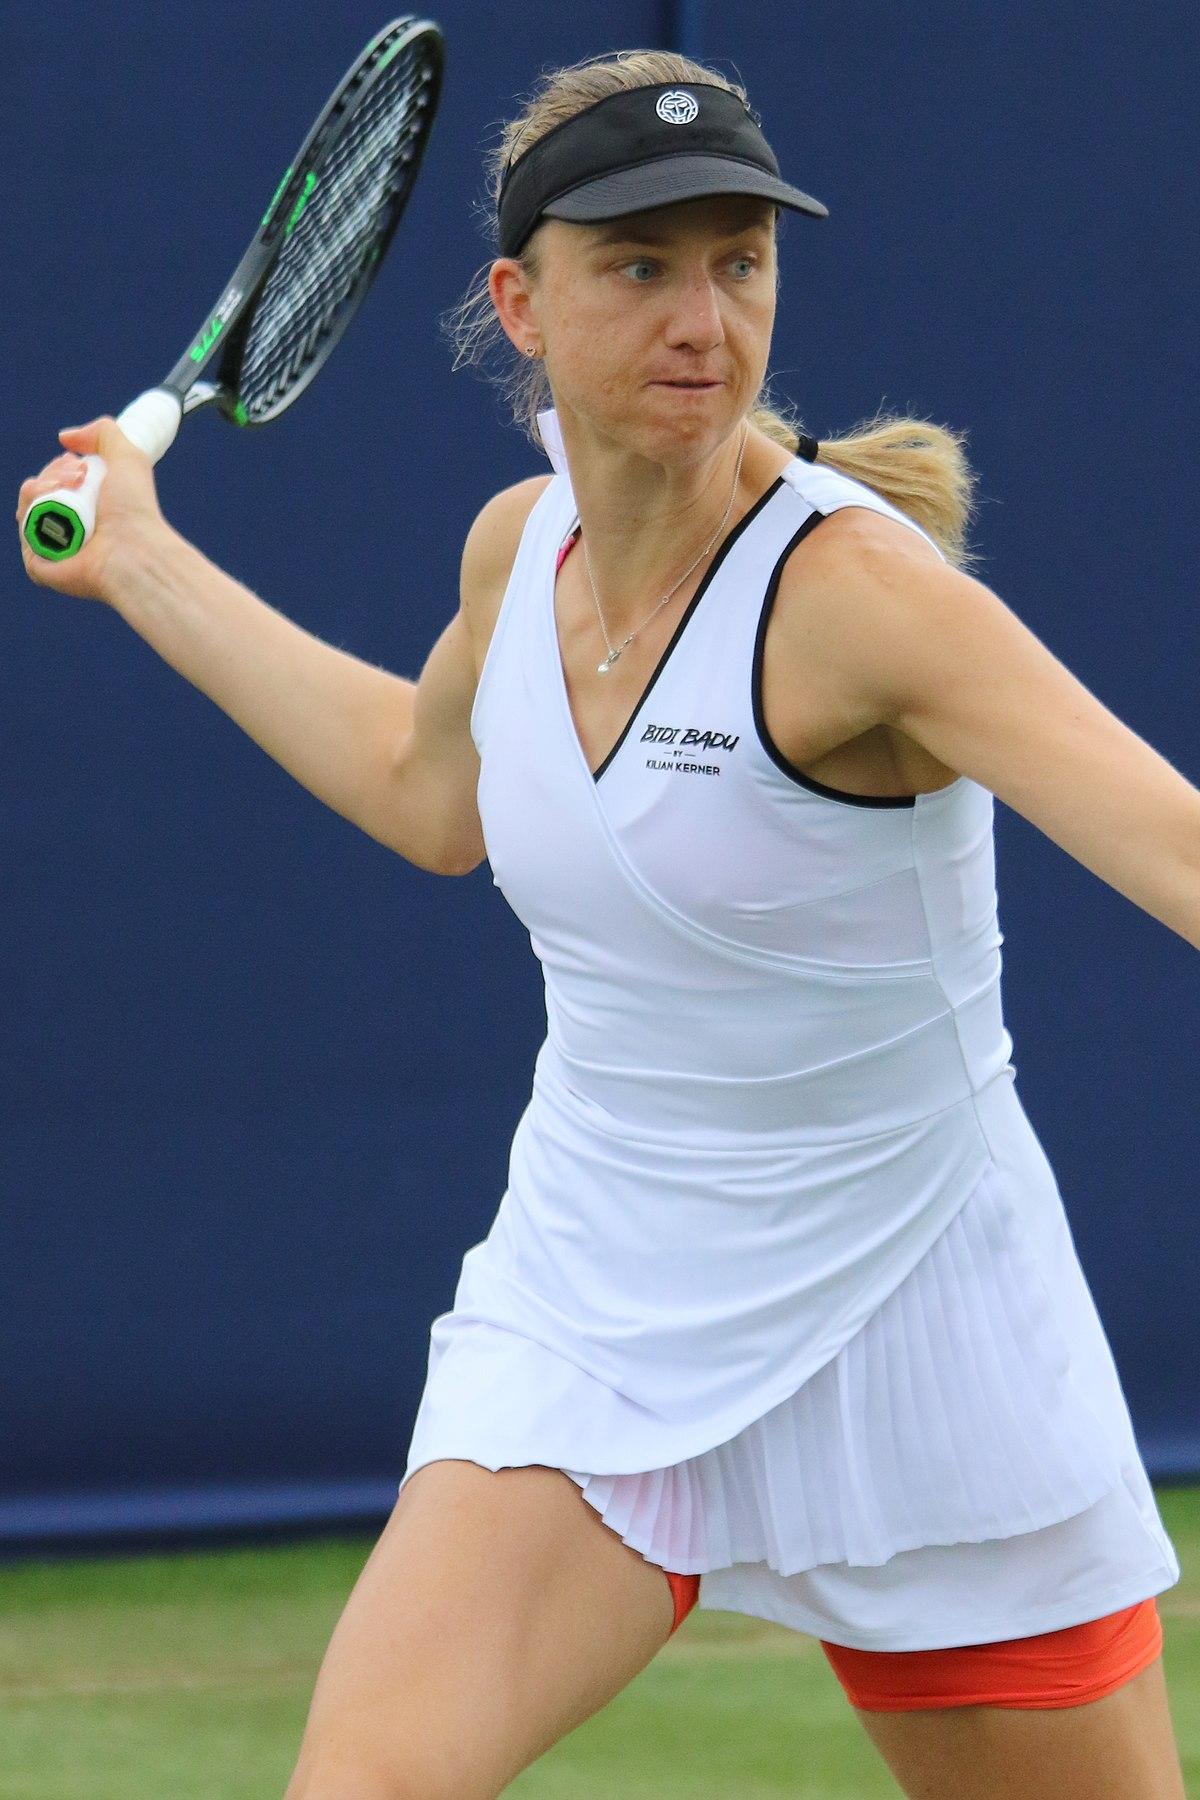 Barthel Tennis